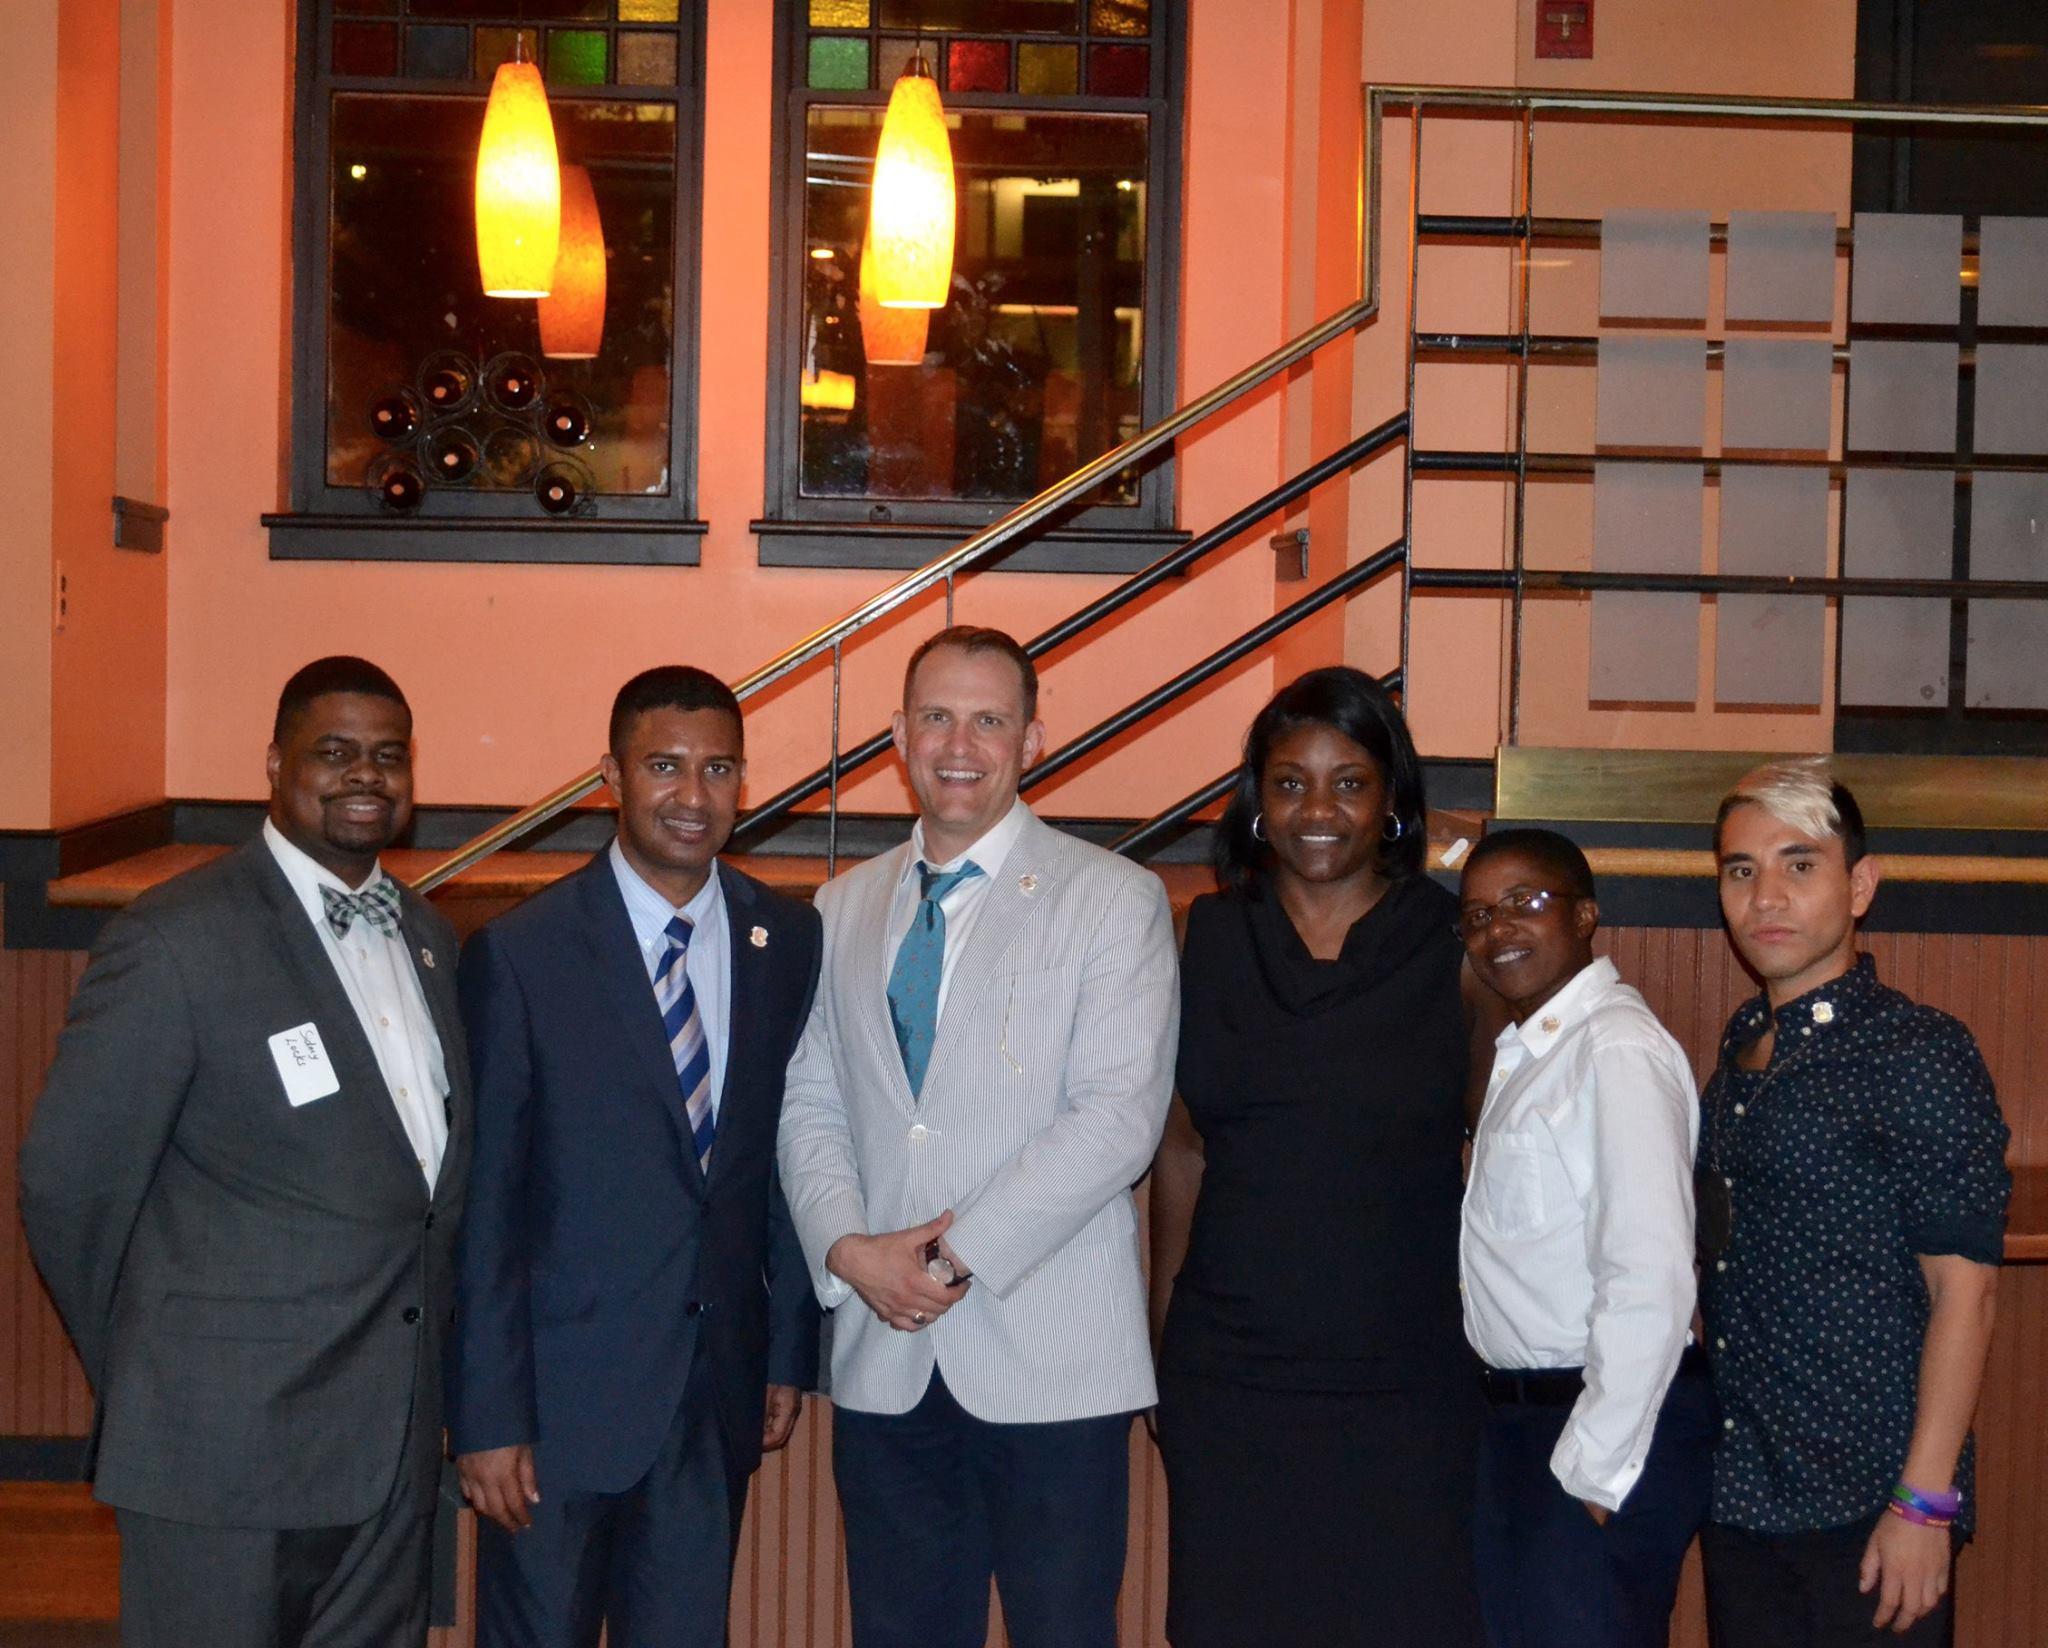 American Veterans Committee Reception